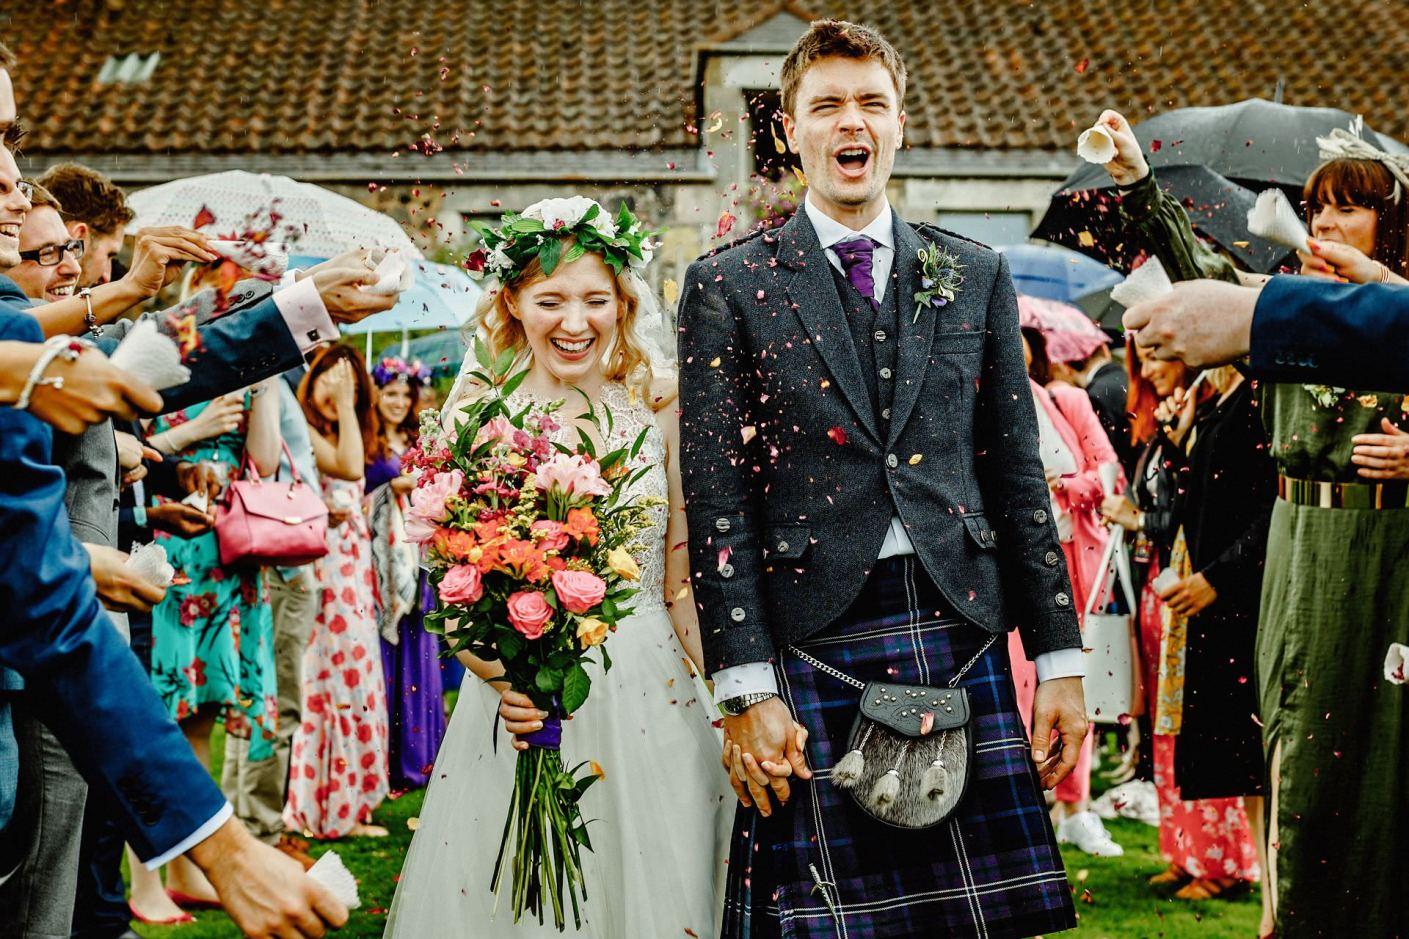 wedding at kilrie granary in fife, scotland